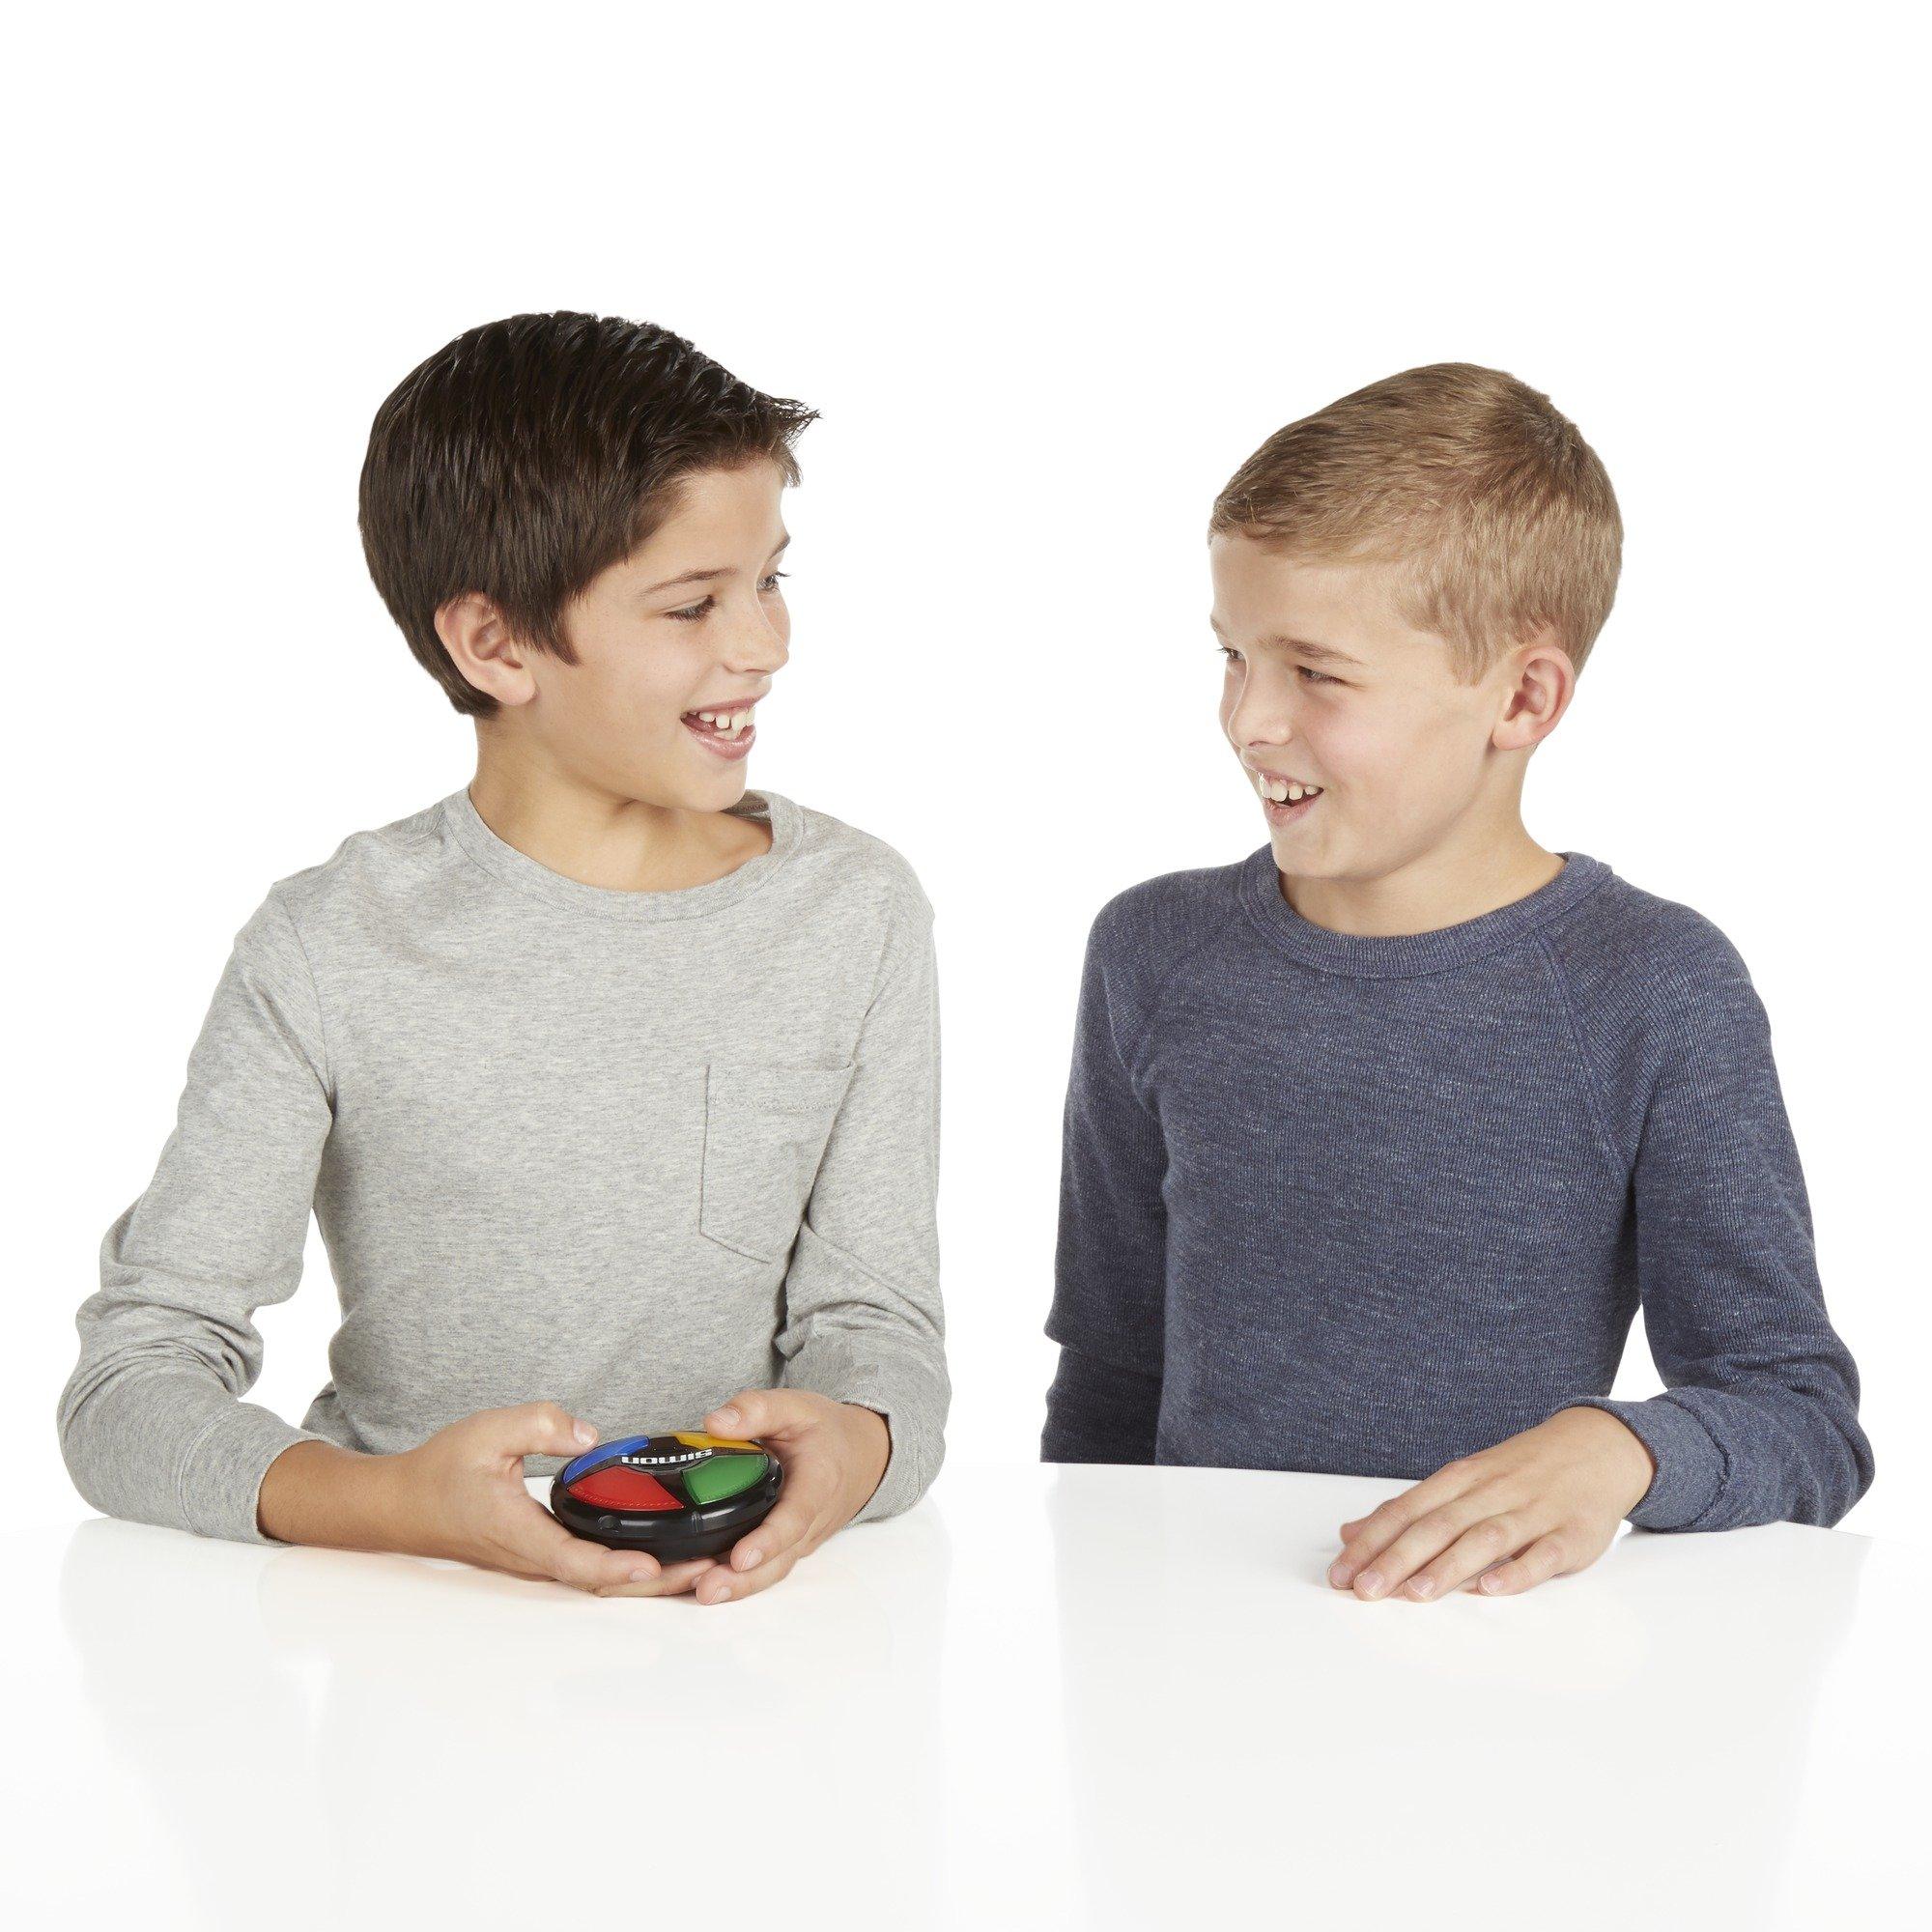 Hasbro Gaming Simon Micro Series Game by Hasbro Gaming (Image #9)